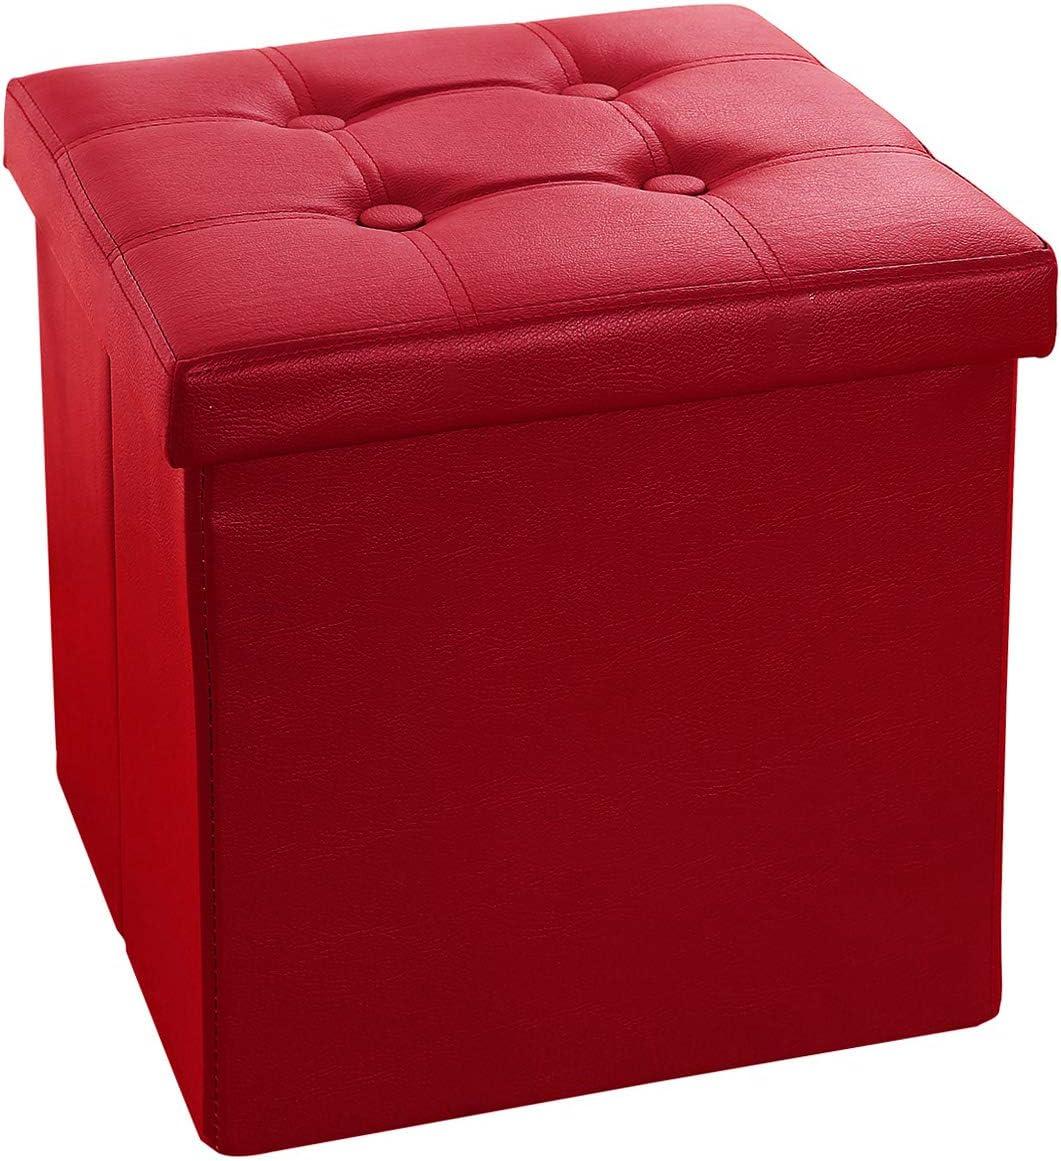 AmasSmile Seasonal Wrap Introduction Folding Storage Ottoman Cube 15x15x15 inch Leat Over item handling ☆ Faux